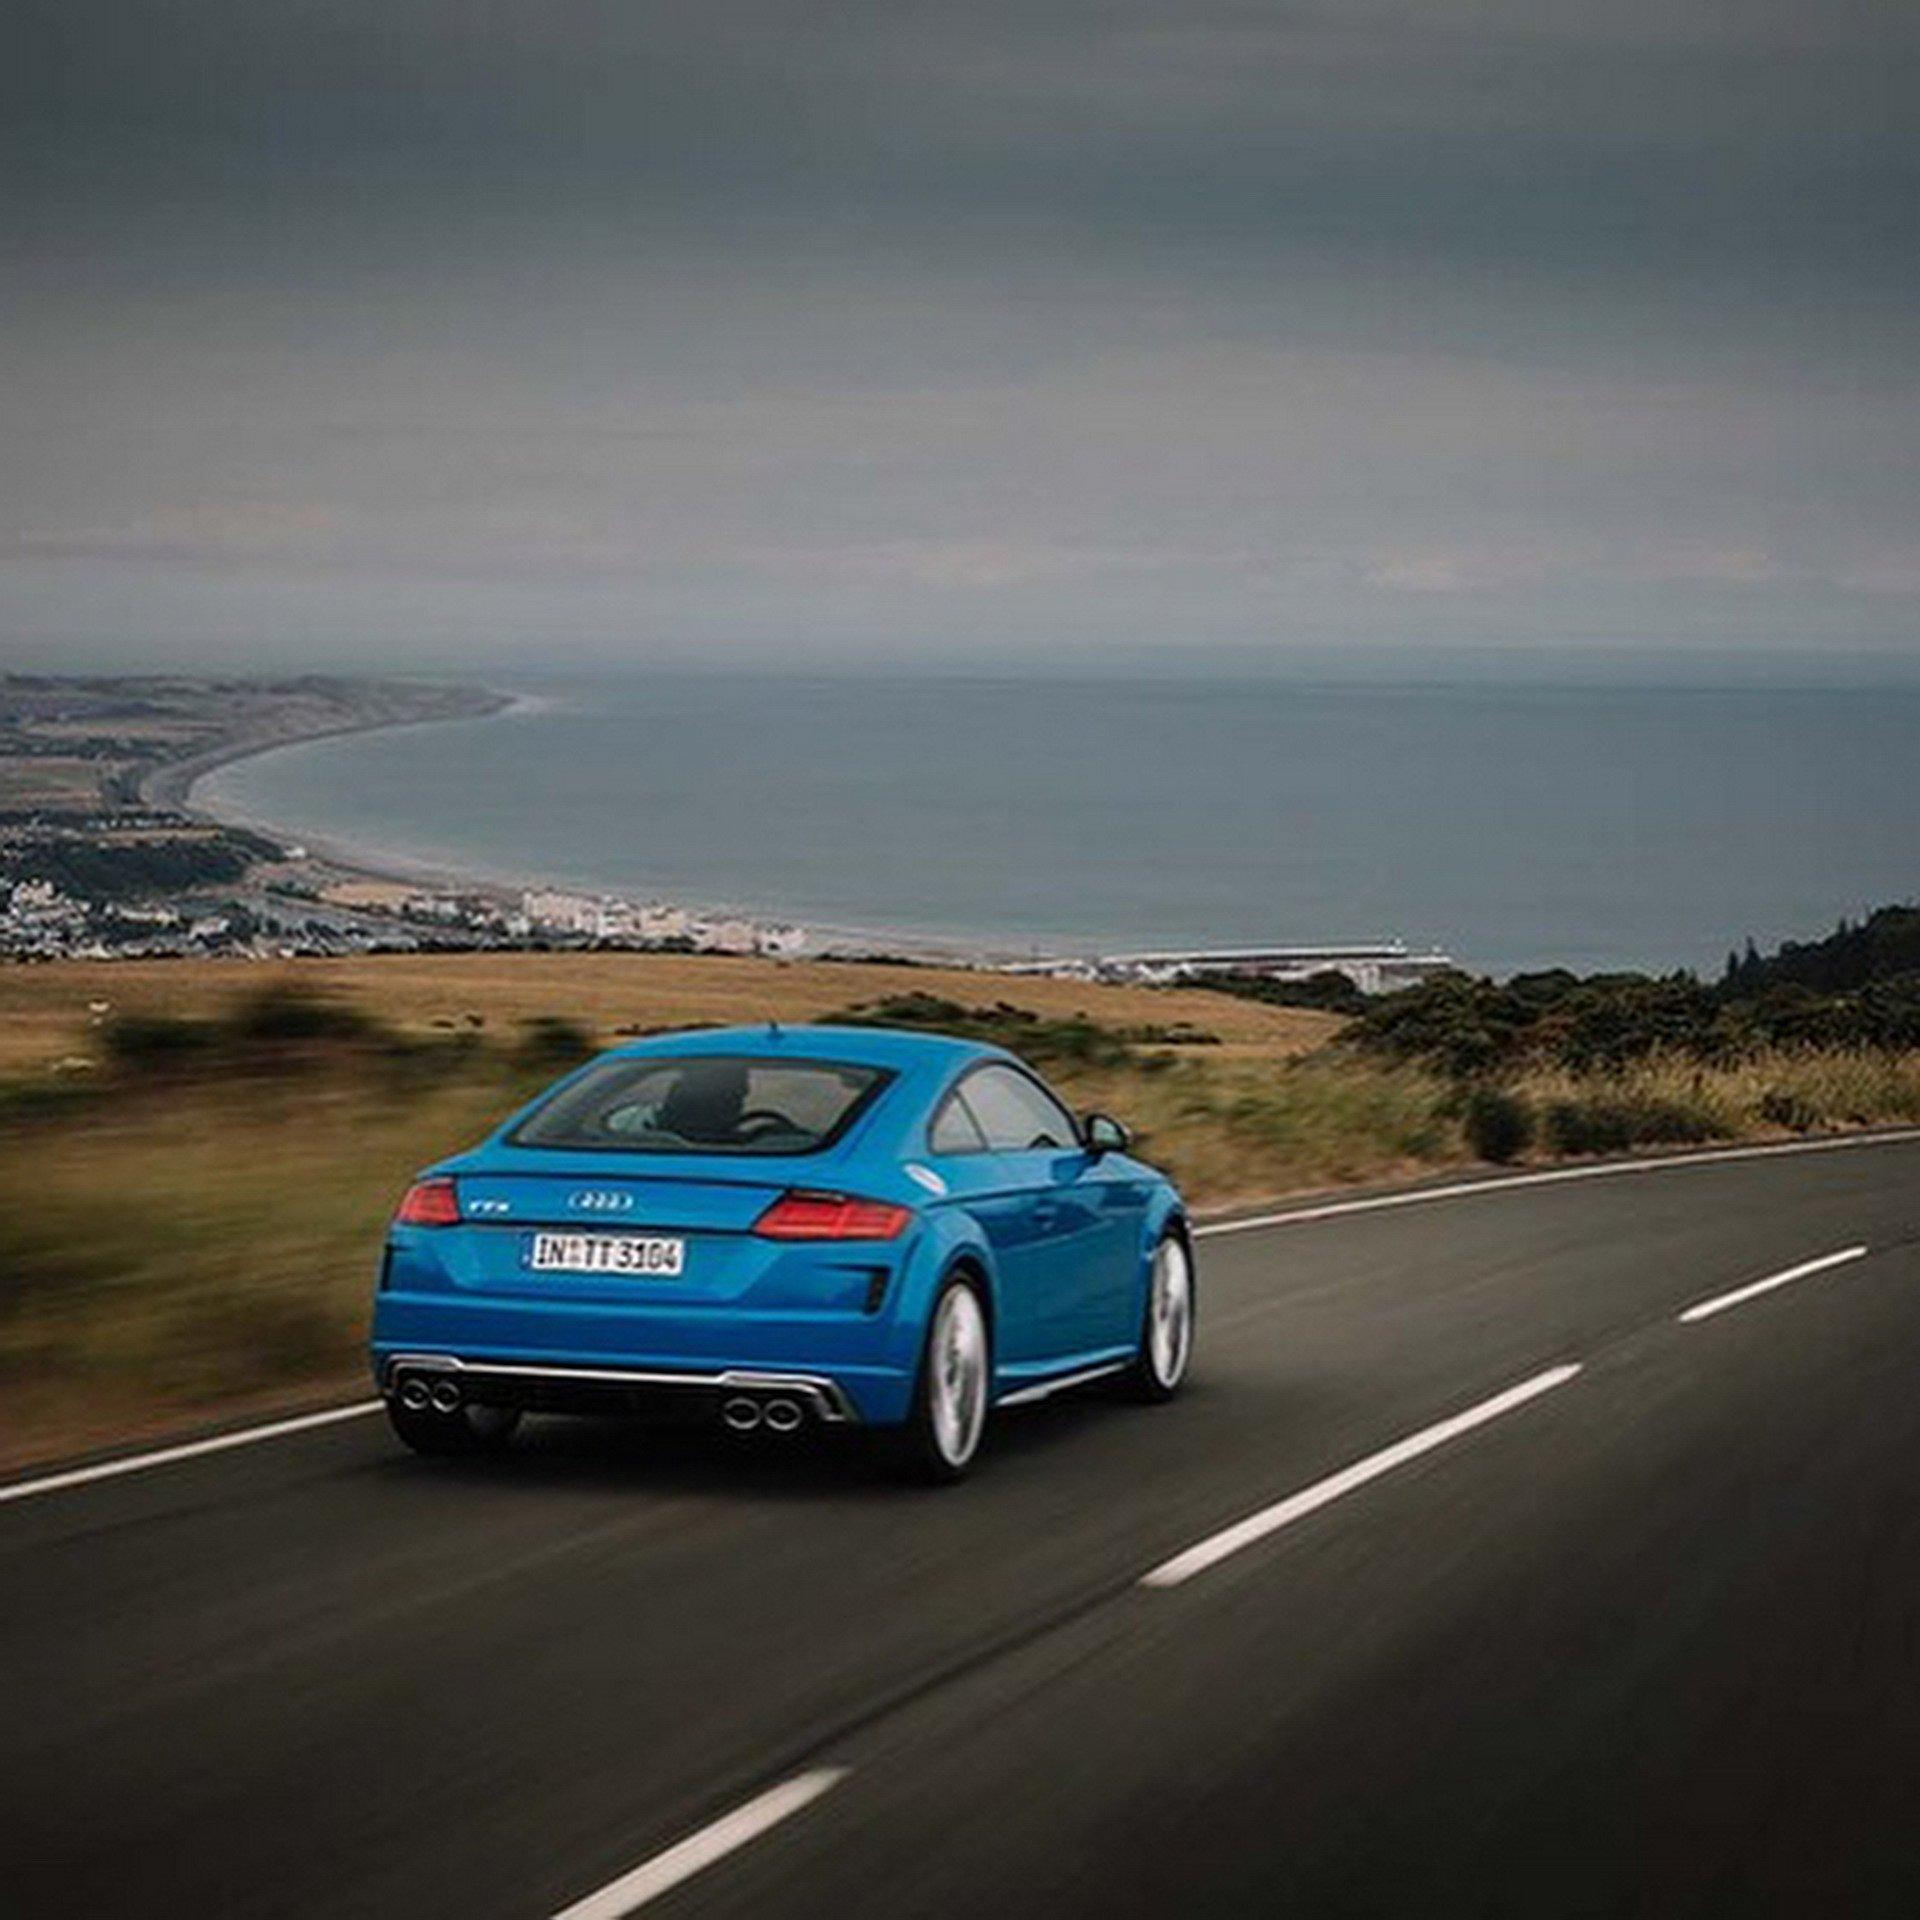 2019 Audi TT Facelift Leaked: TTS Loses 4 HP, TT RS Looks ...